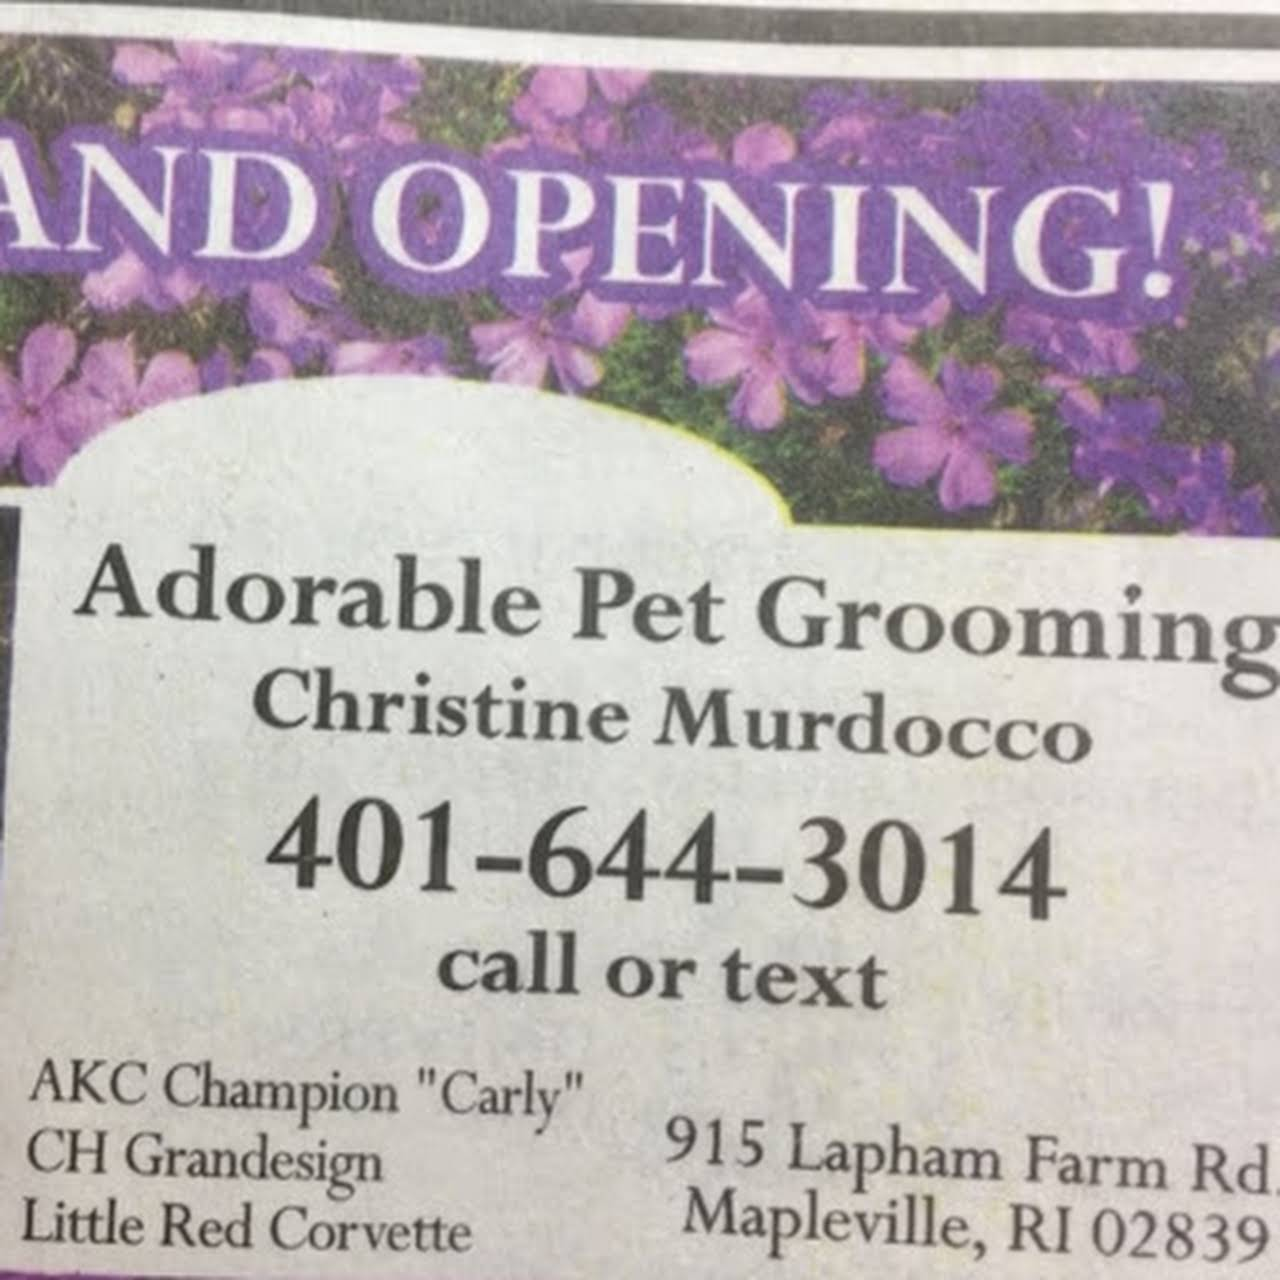 Adorable Pet Grooming - Pet Groomer